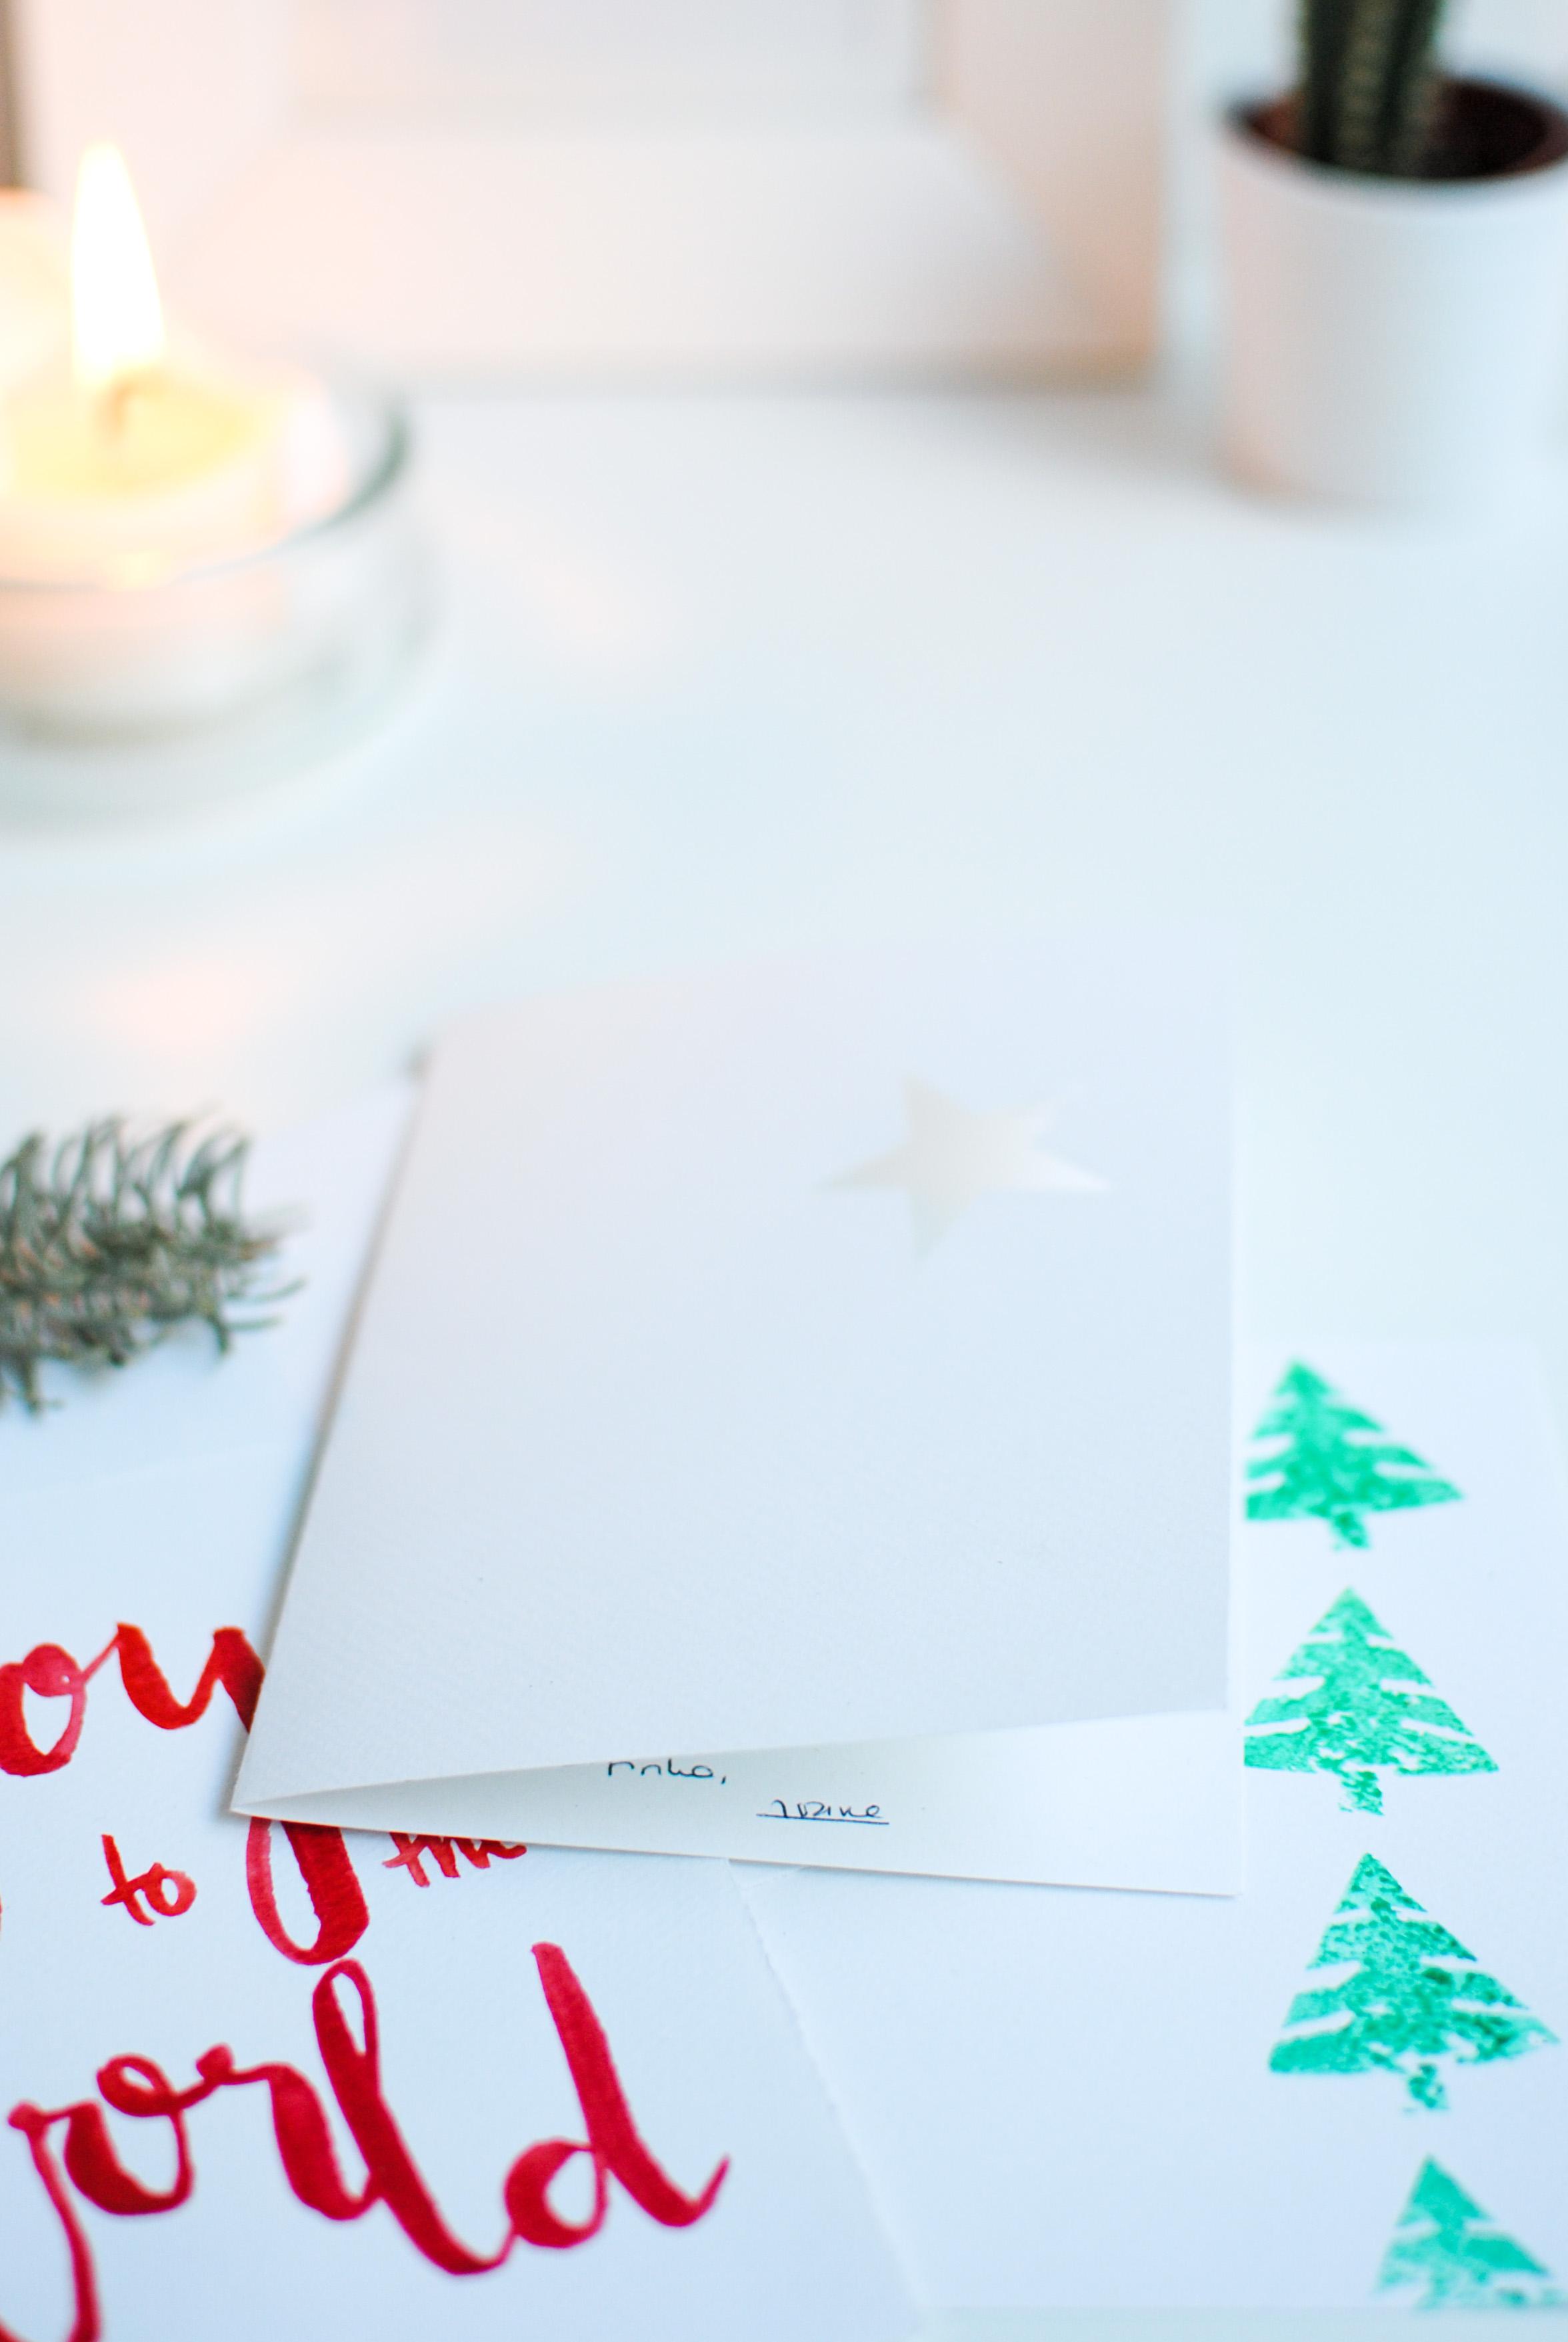 christmas cards | please consider | joana limao